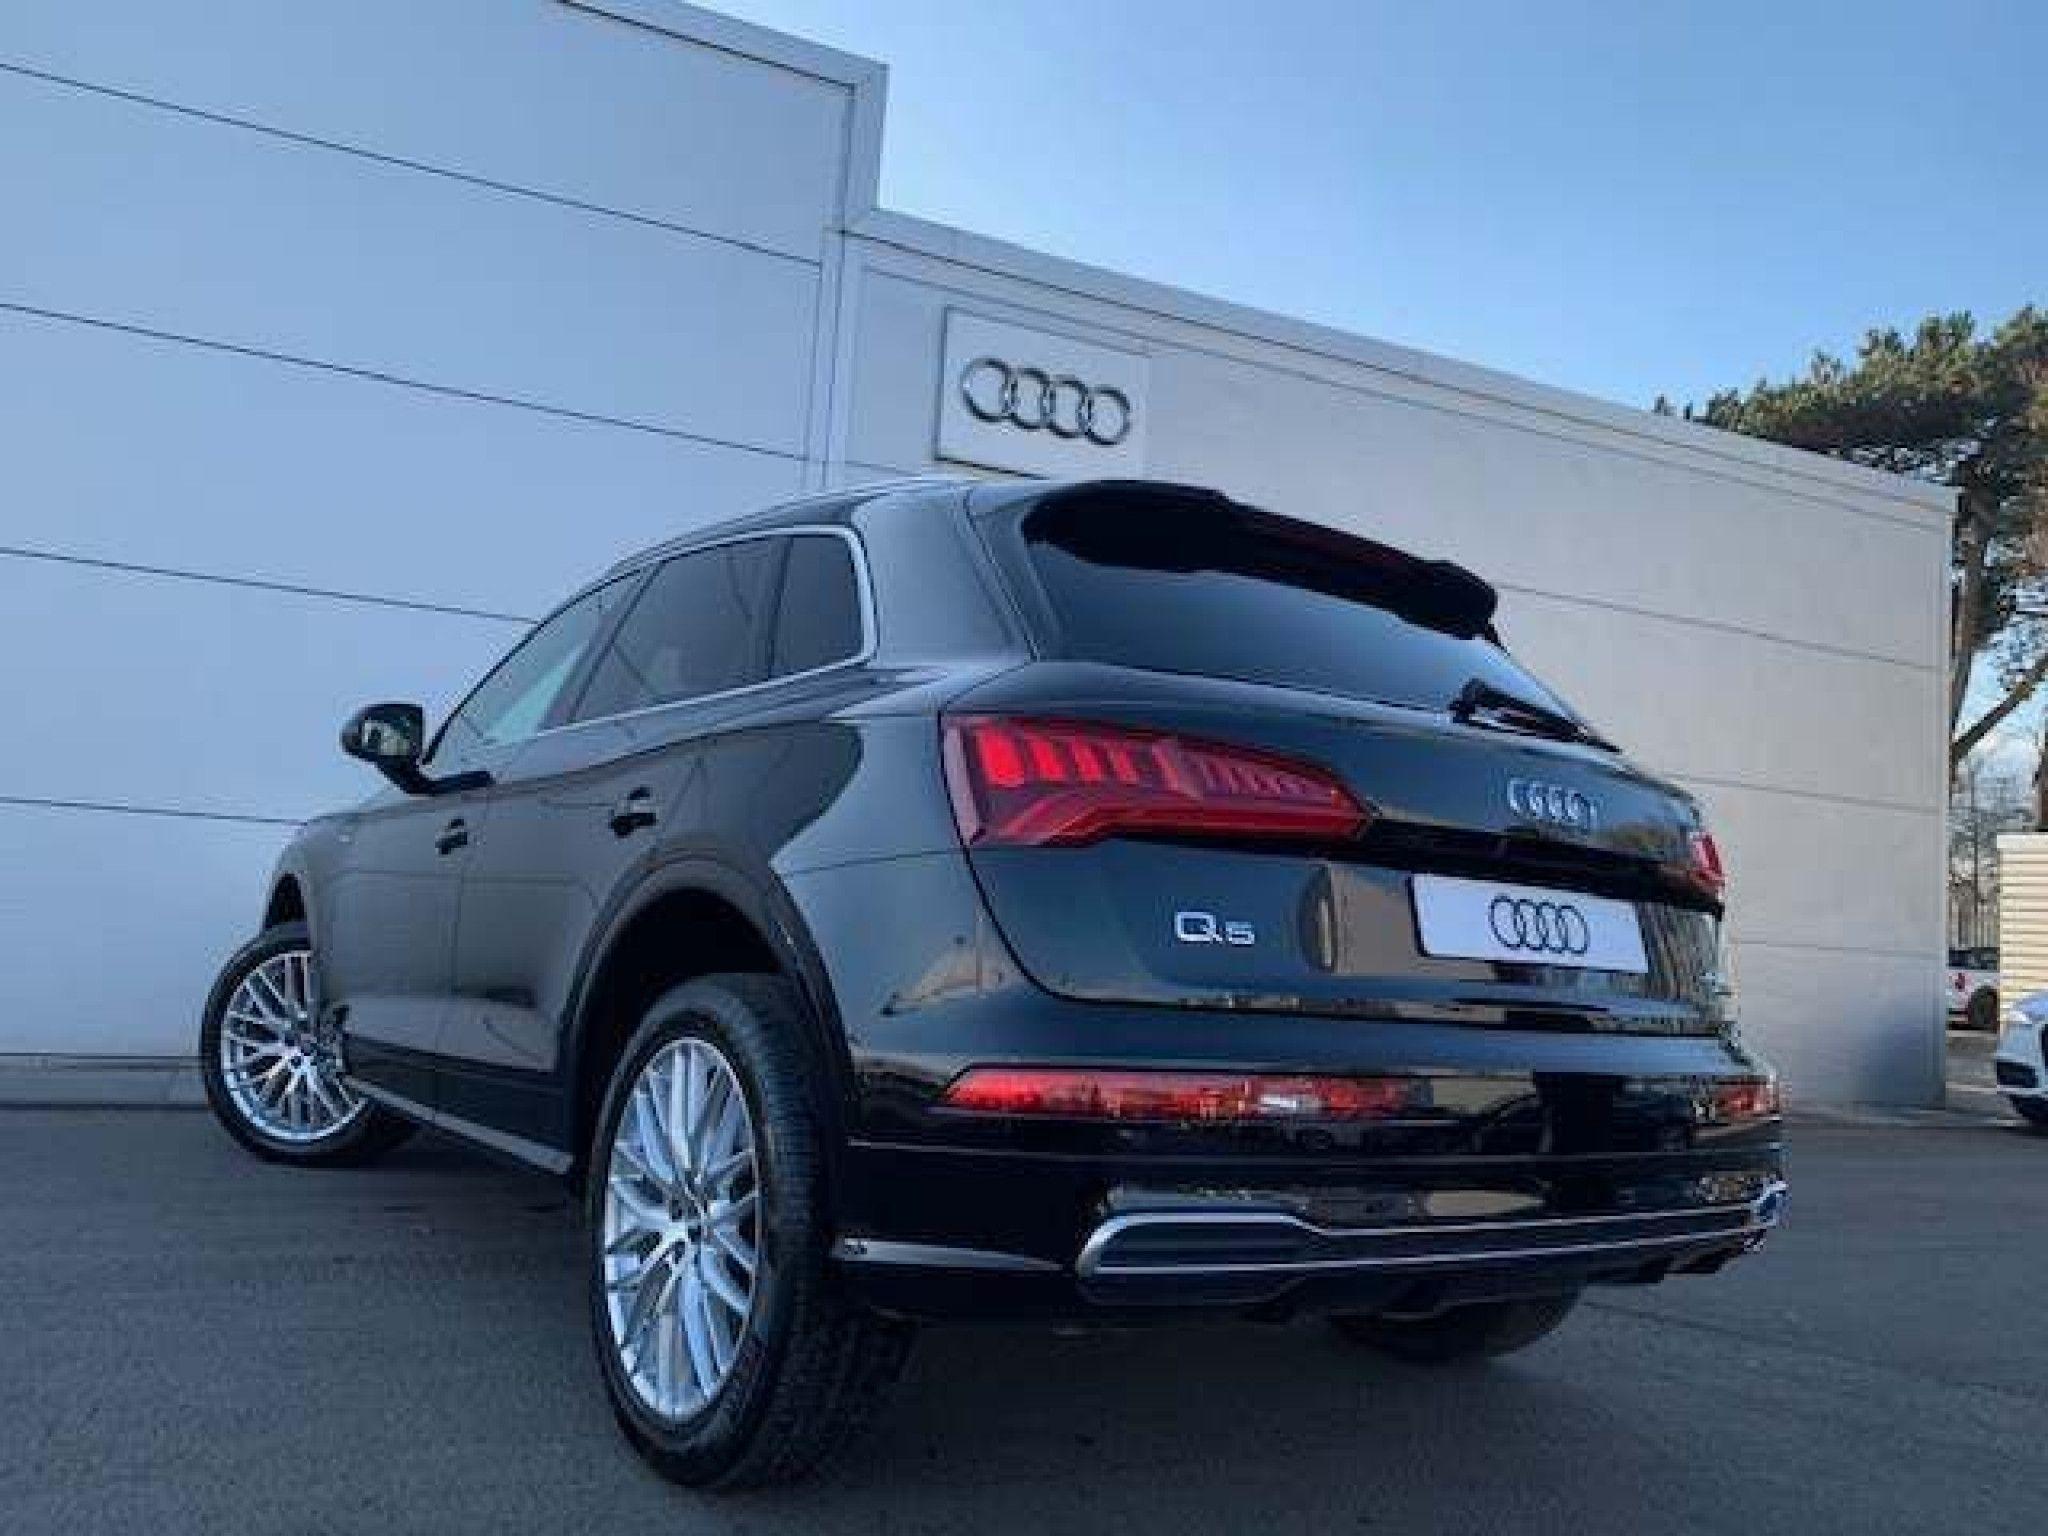 Audi Q5 2 0 Tdi 40 S Line S Tronic Quattro S S 5dr In 2020 Audi Q5 Audi Tdi